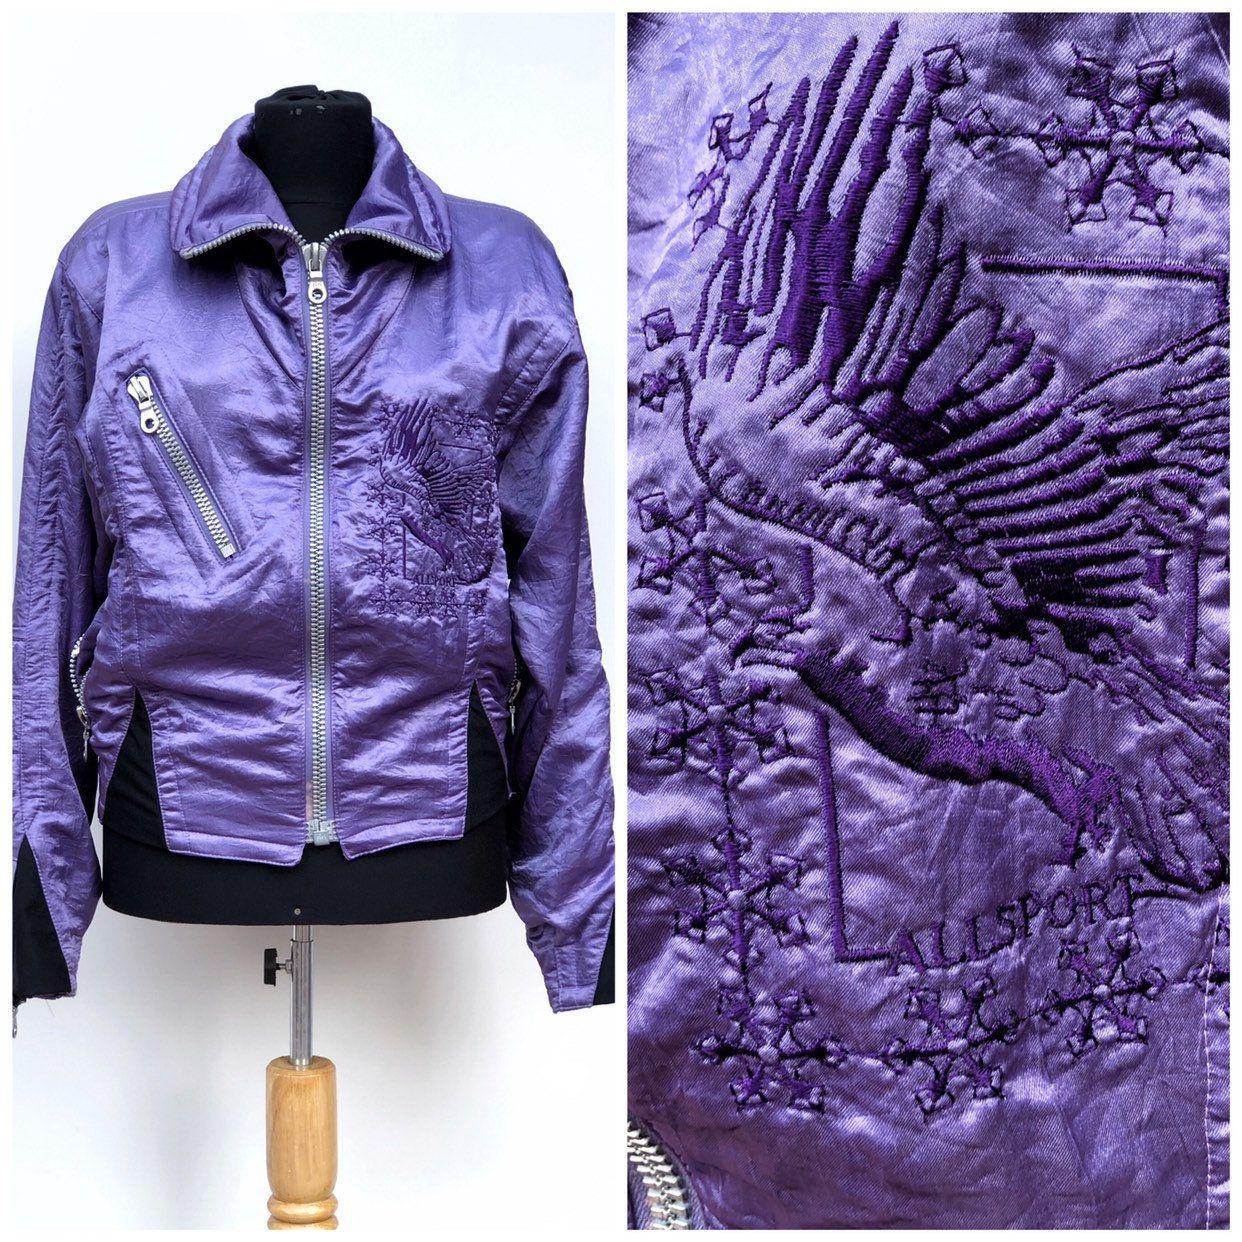 90s Allsport Brand Purple Bomber Jacketwoman Vintage Puffy Etsy Purple Bomber Jacket Bomber Jacket Women Satin Bomber Jacket [ 1242 x 1242 Pixel ]